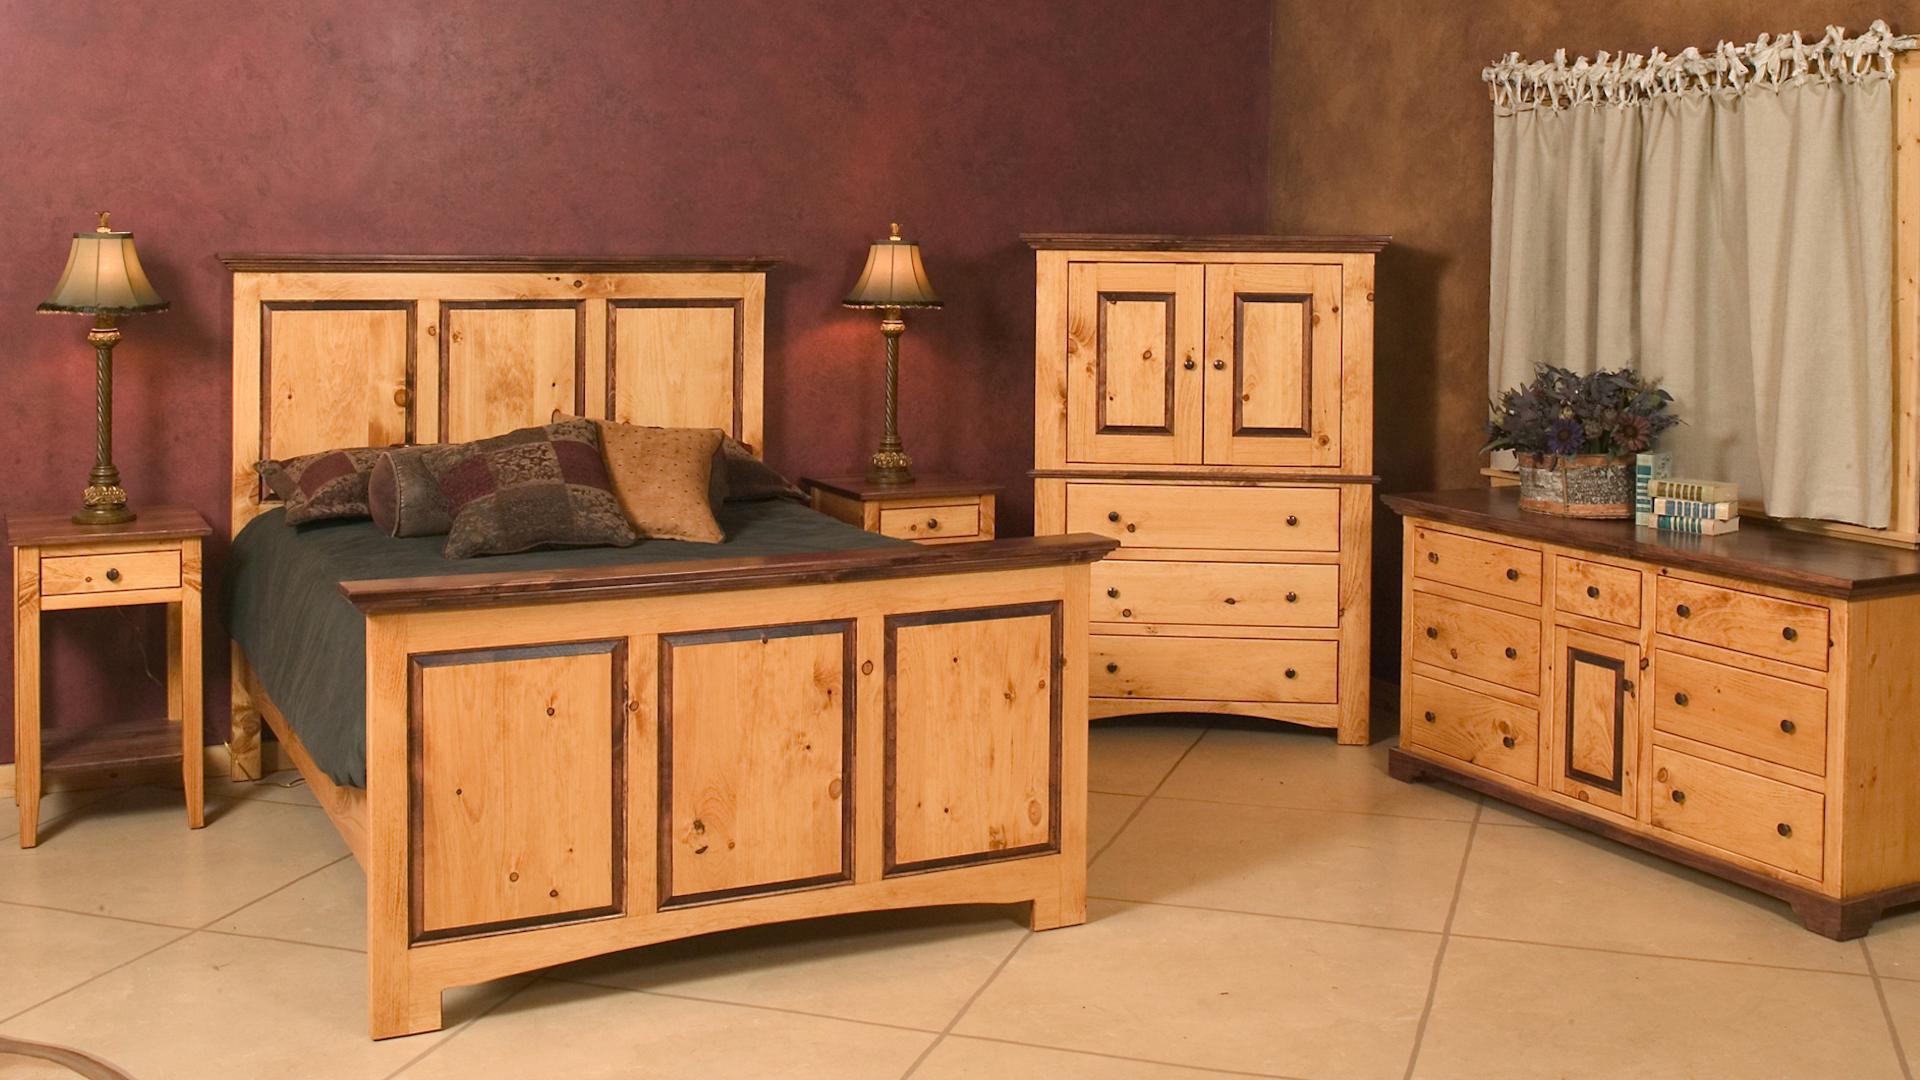 La Tranquera La Empresa De Muebles De Pino Macizo Busca  # Muebles Santa Fe